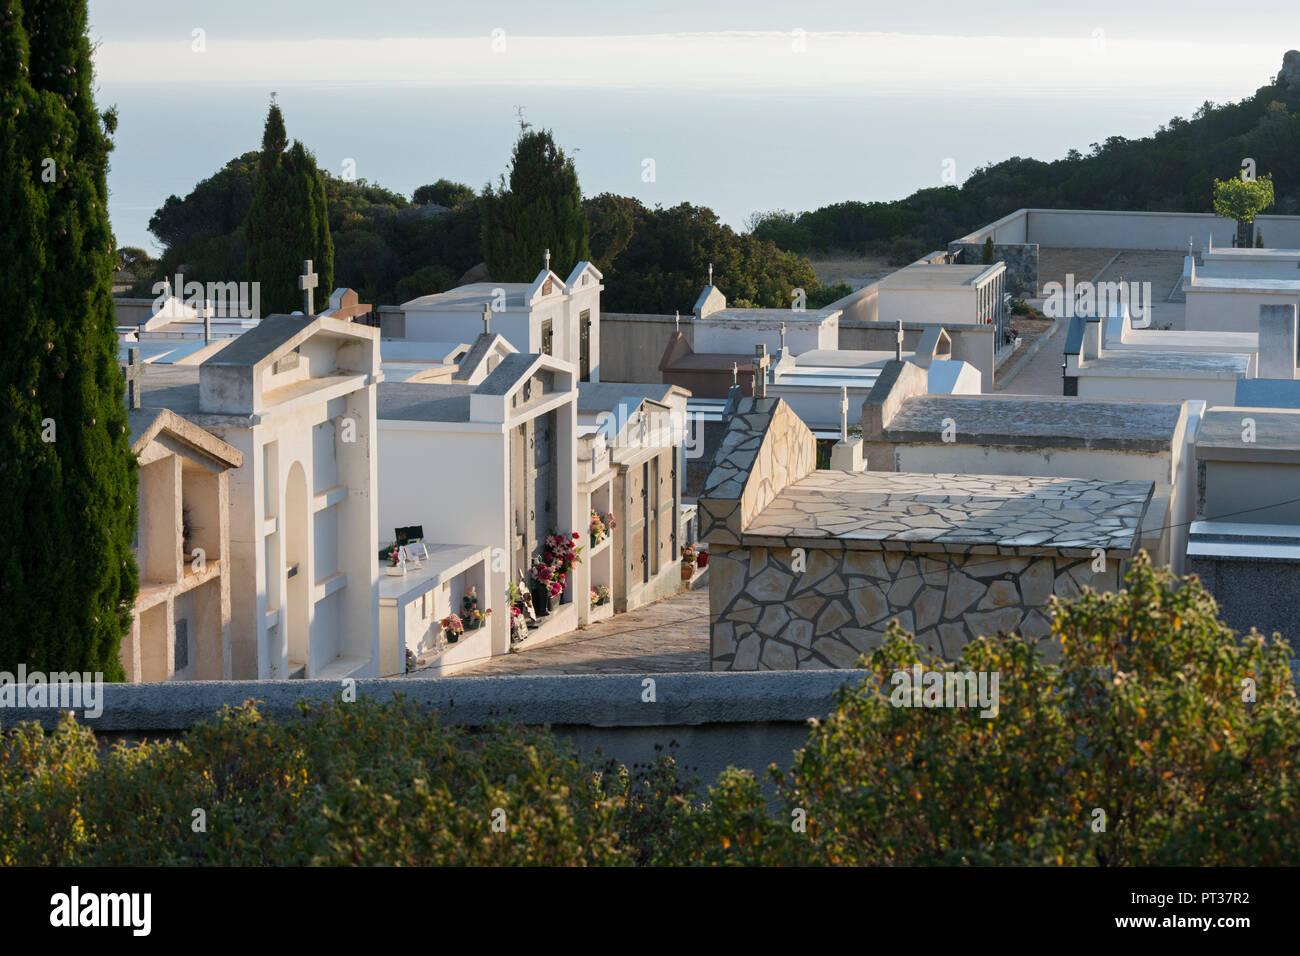 Friedhof am Notre Dame de la Serra, Calvi, Korsika, Frankreich Stockbild